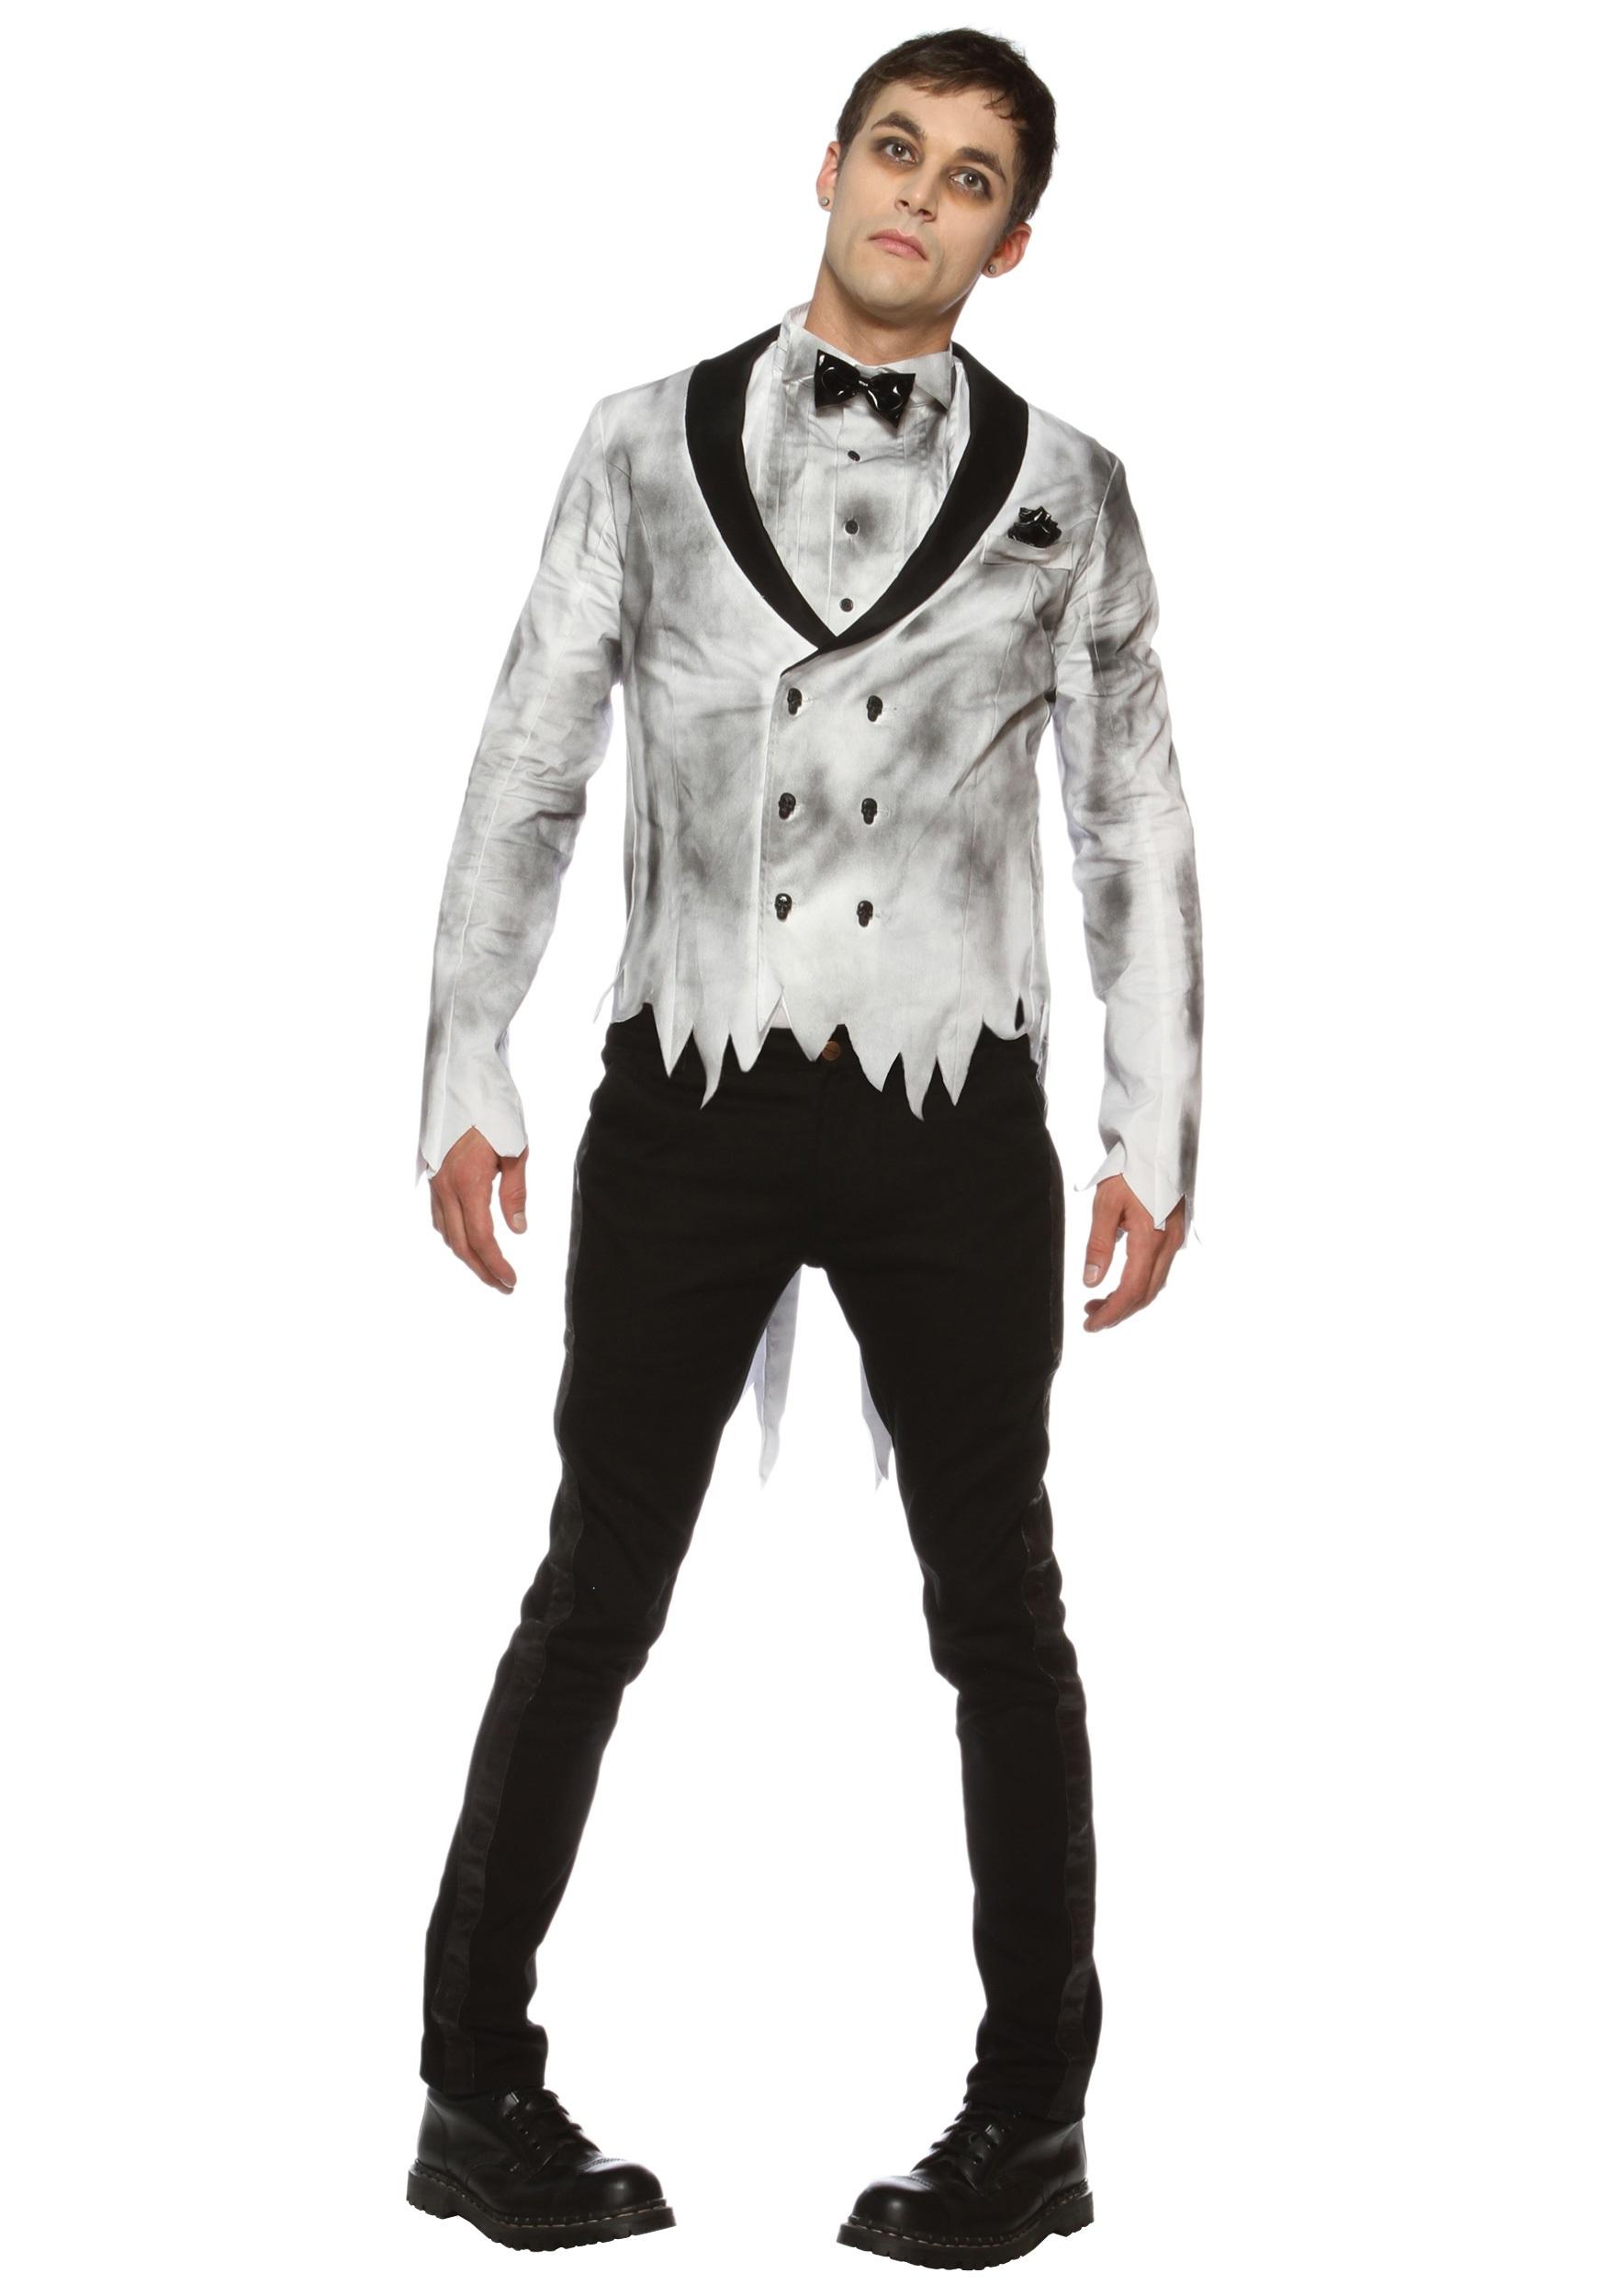 Zombie Groom Costume  sc 1 st  Halloween Costumes & Zombie Costumes u0026 Walking Dead Costumes - HalloweenCostumes.com